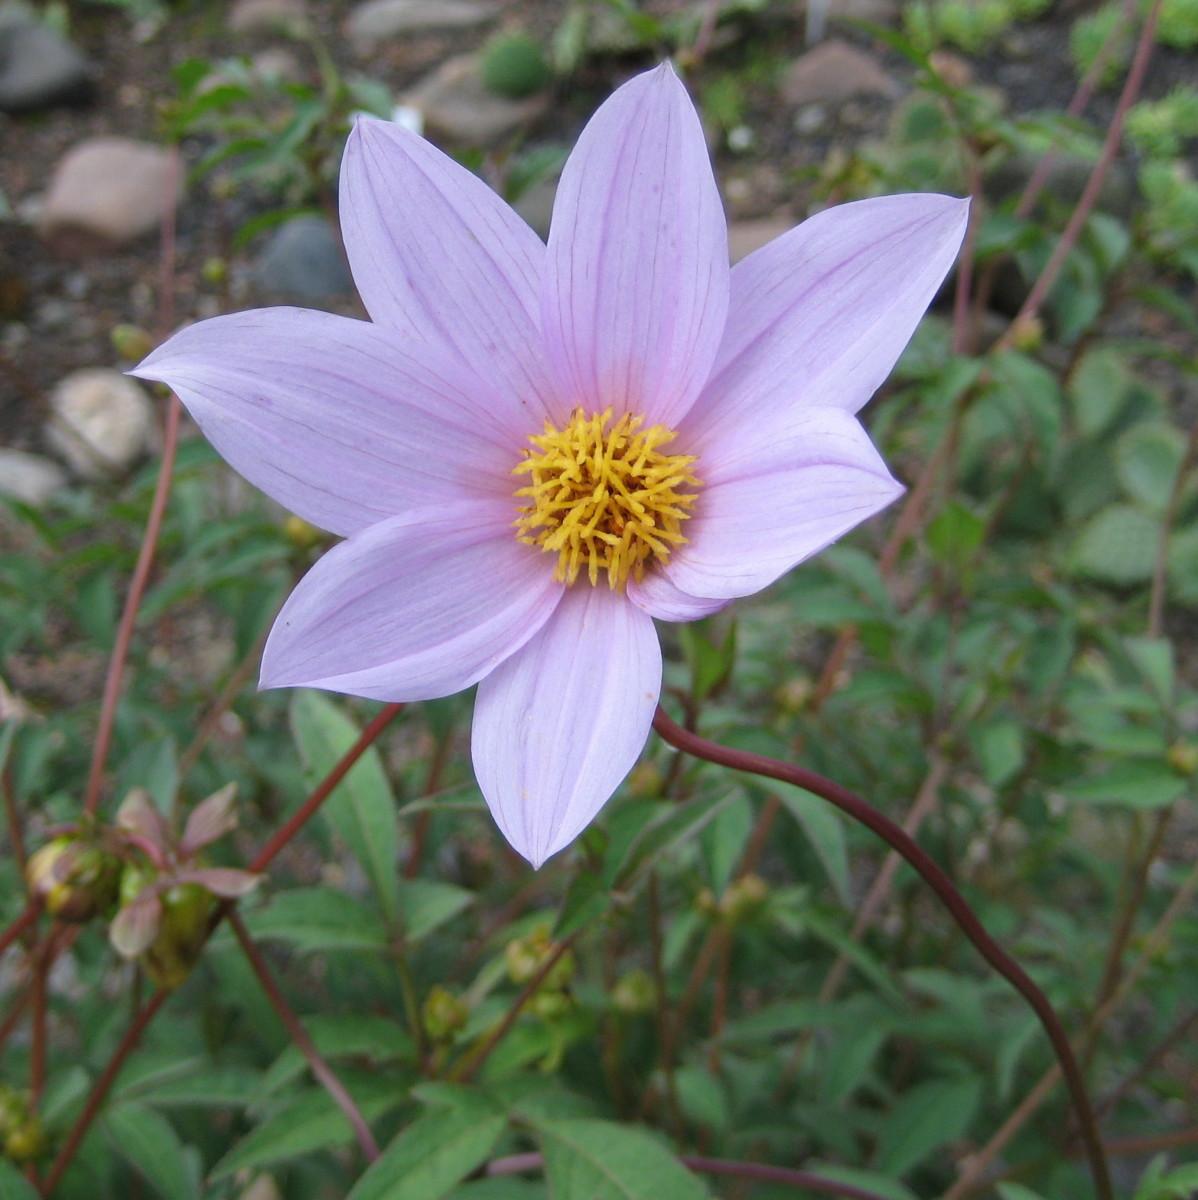 Dahlia is a very beautiful fall flower.